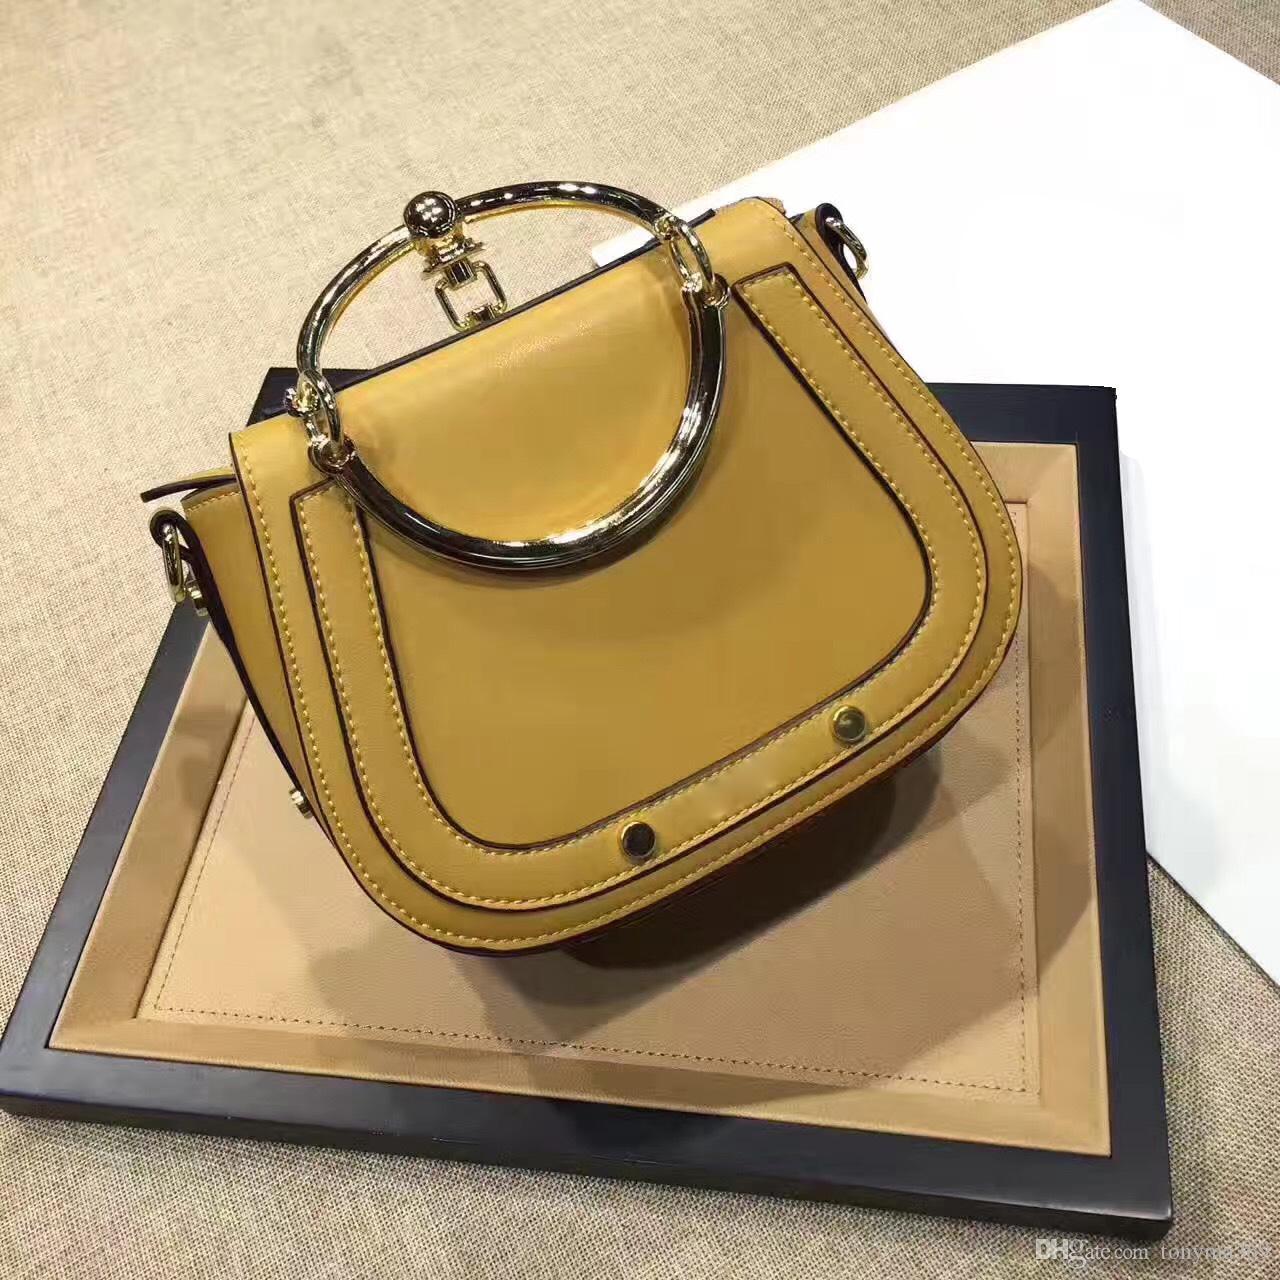 16ce255beb5ed New Fashion Women Clutch Bag Designer Handbag Best Quality Genuine ...